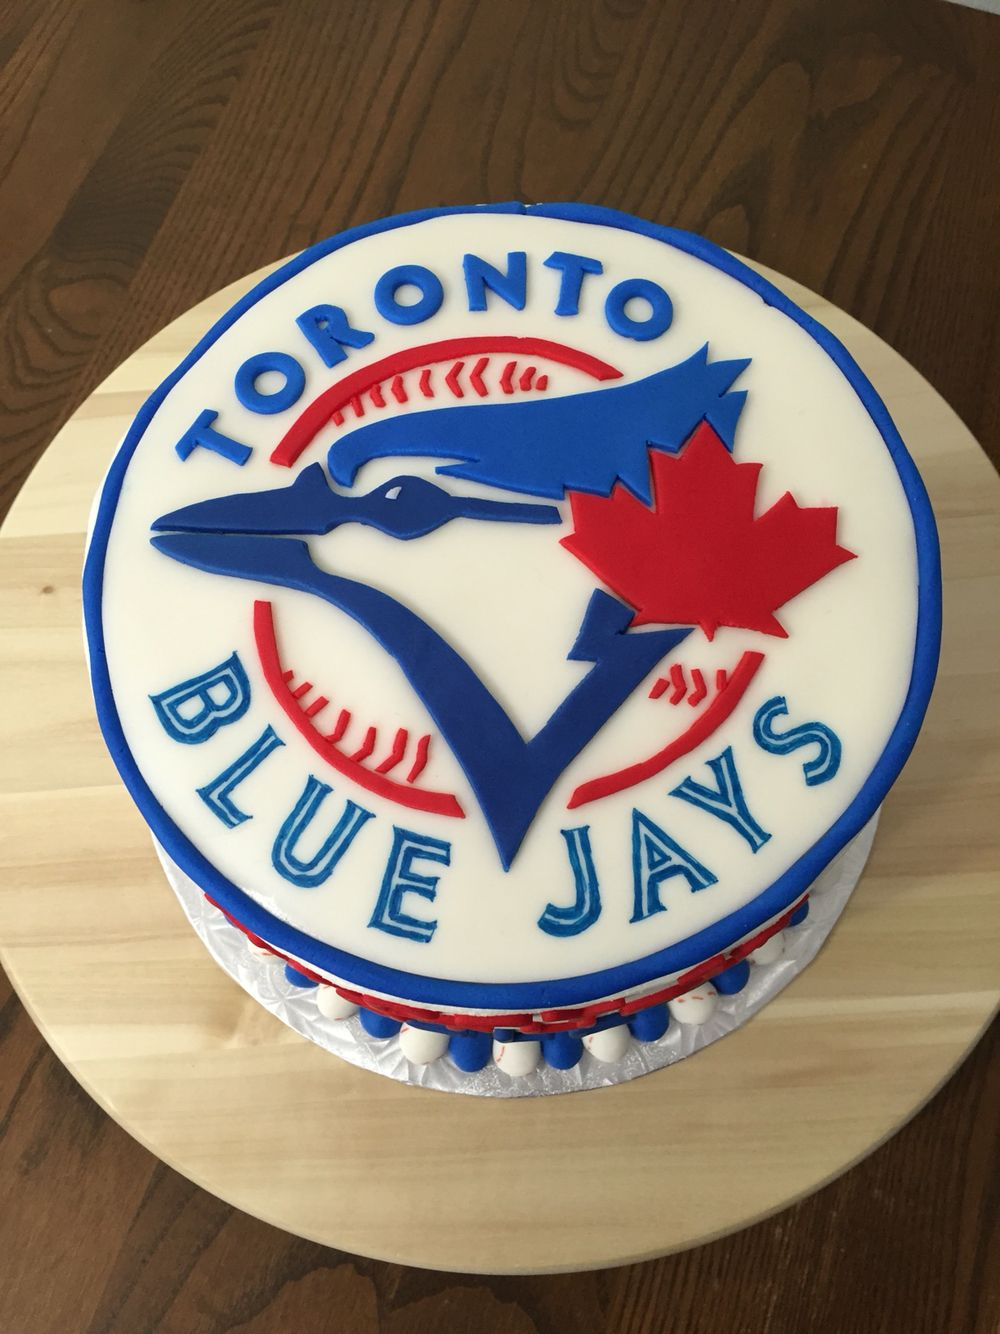 Toronto blue jays logo cake vanilla cake with Venetian cream